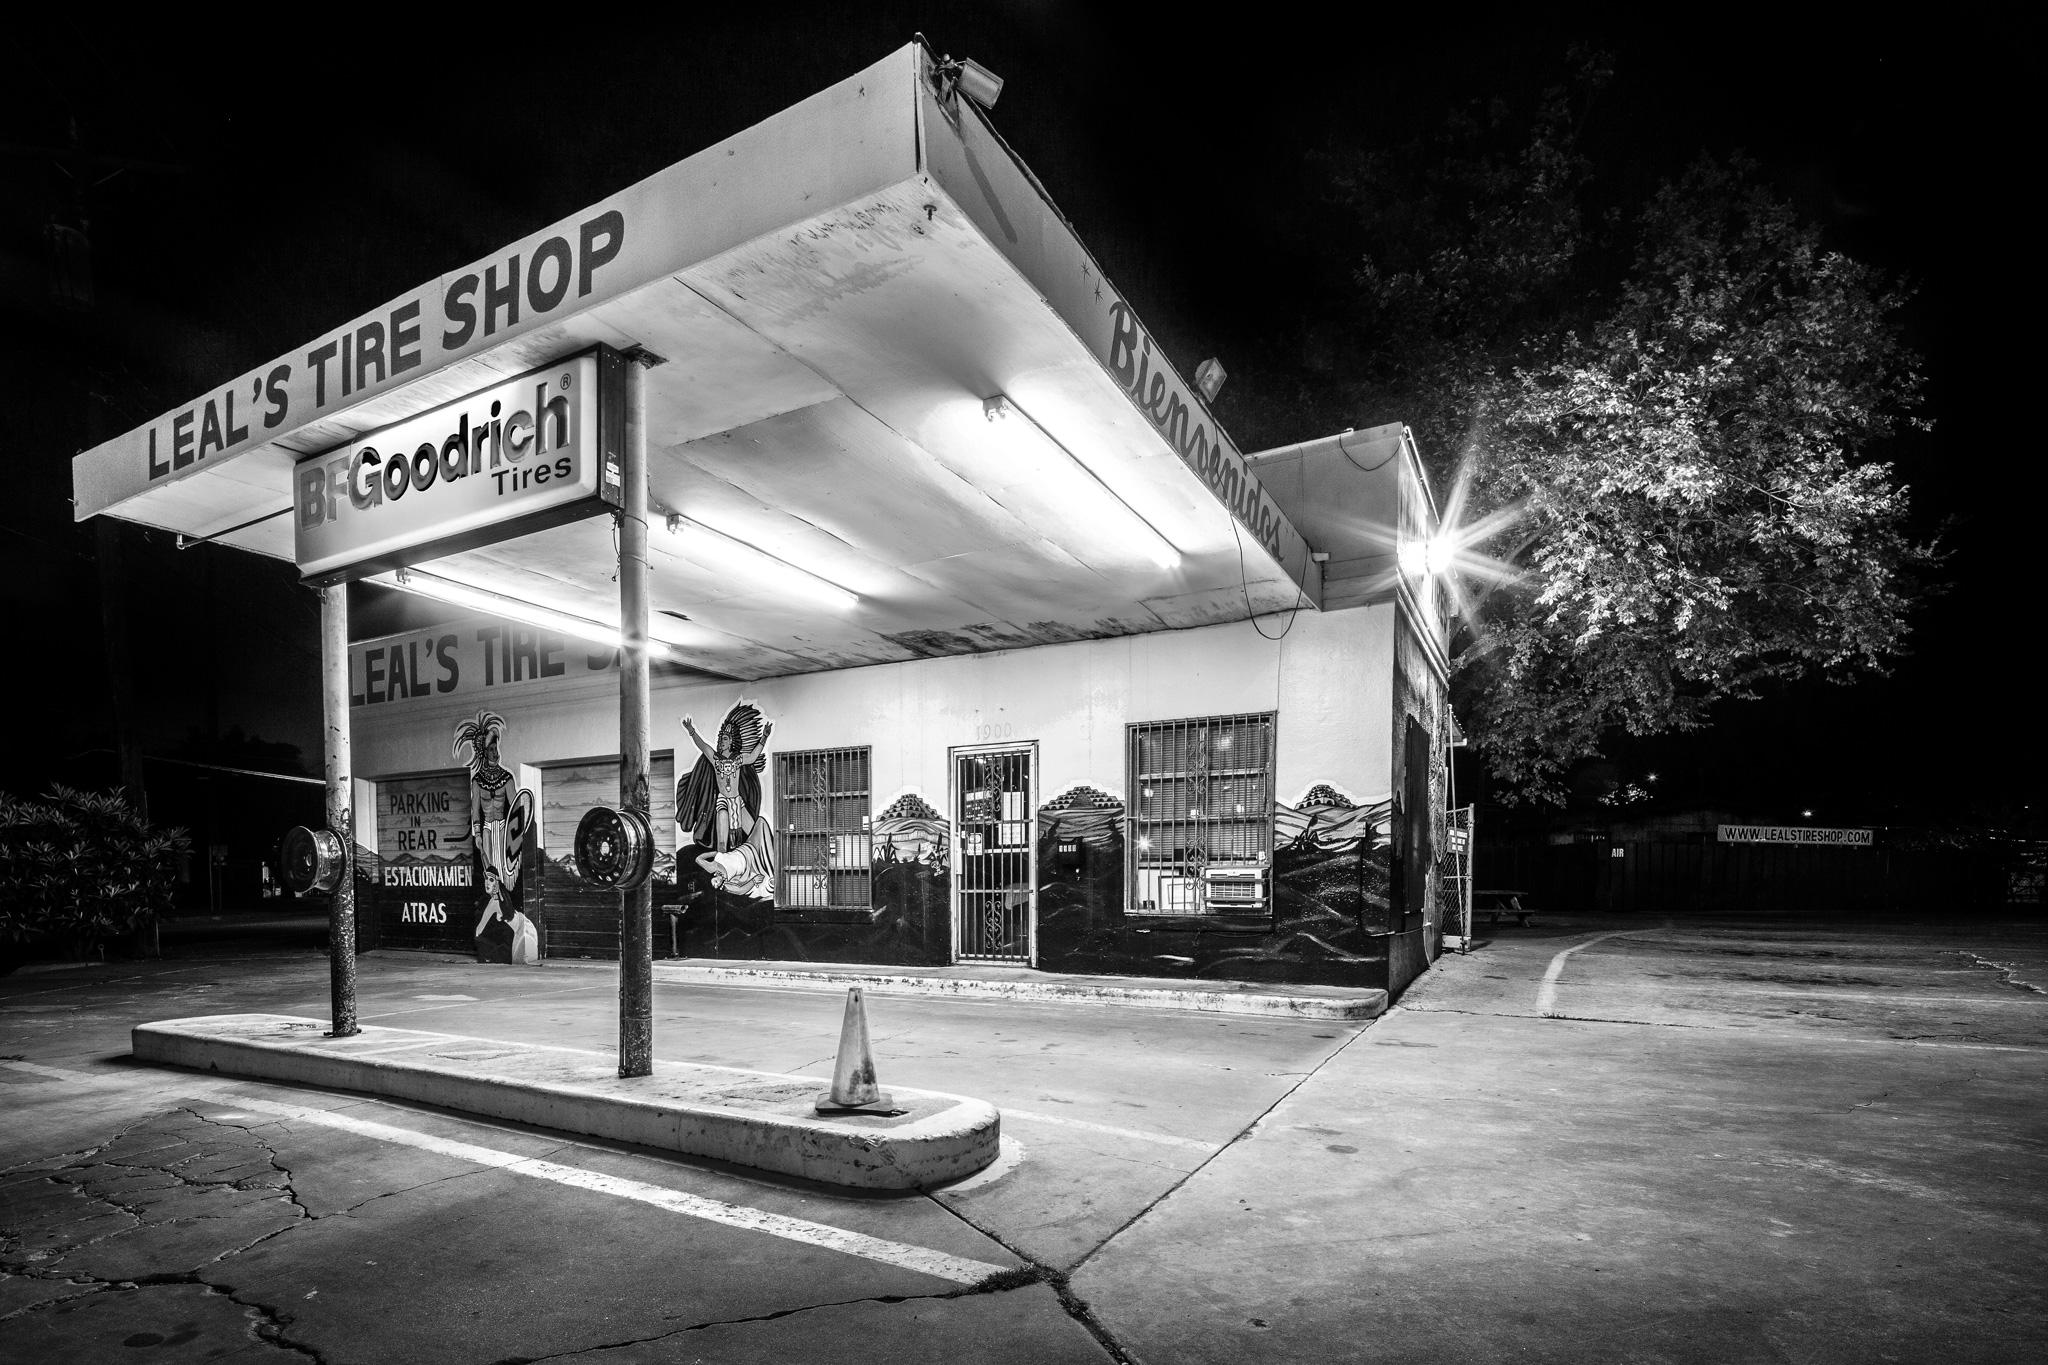 Leals-Tire-Shop-BW.jpg